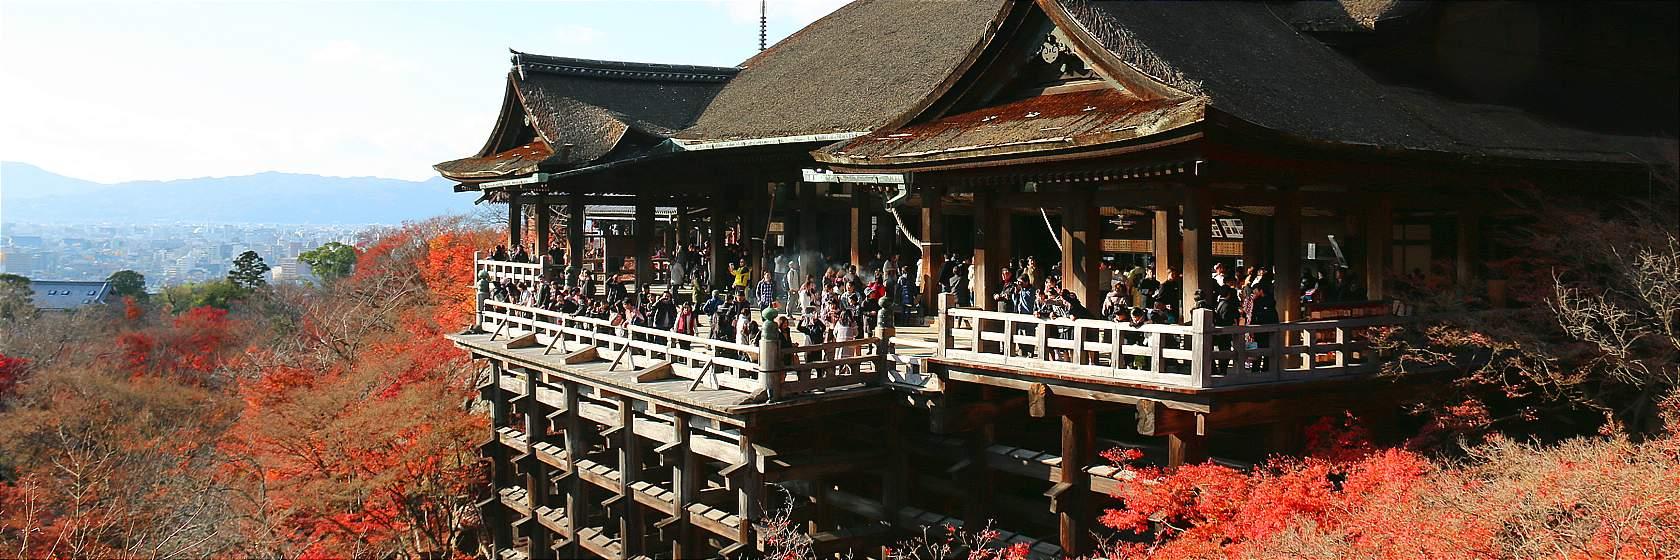 Optional SIC [From Osaka] (1) 1-Day Nara & Kyoto Bus Tour (Round trip from Umeda, Osaka)